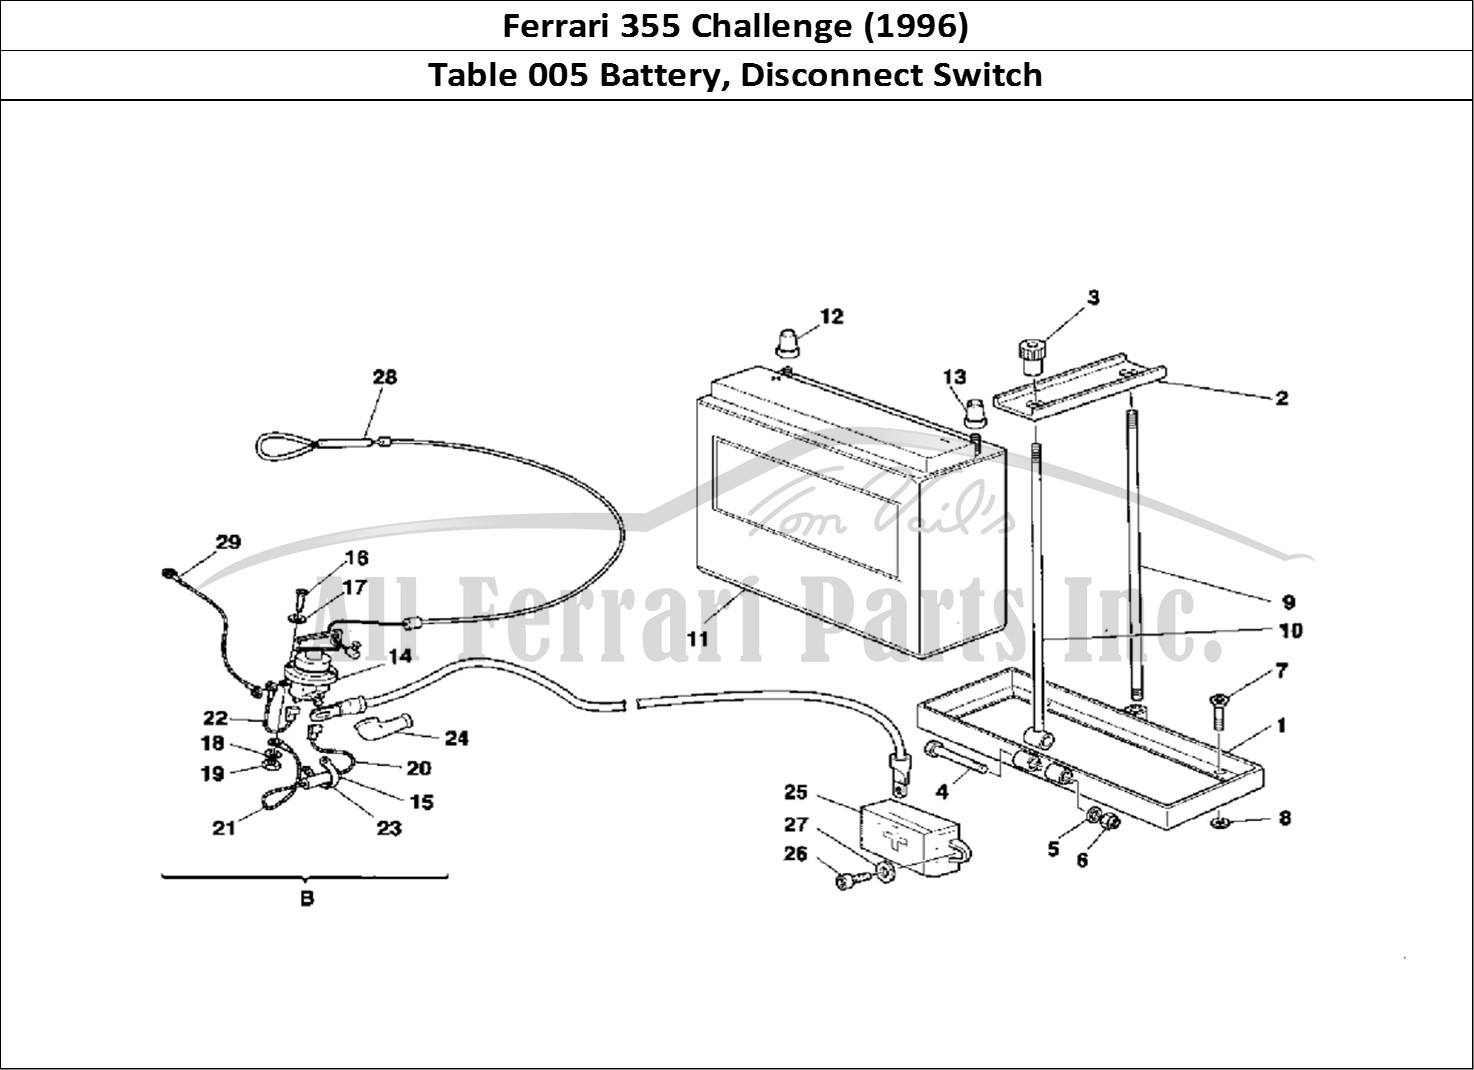 buy original ferrari 355 challenge  1996  005 battery